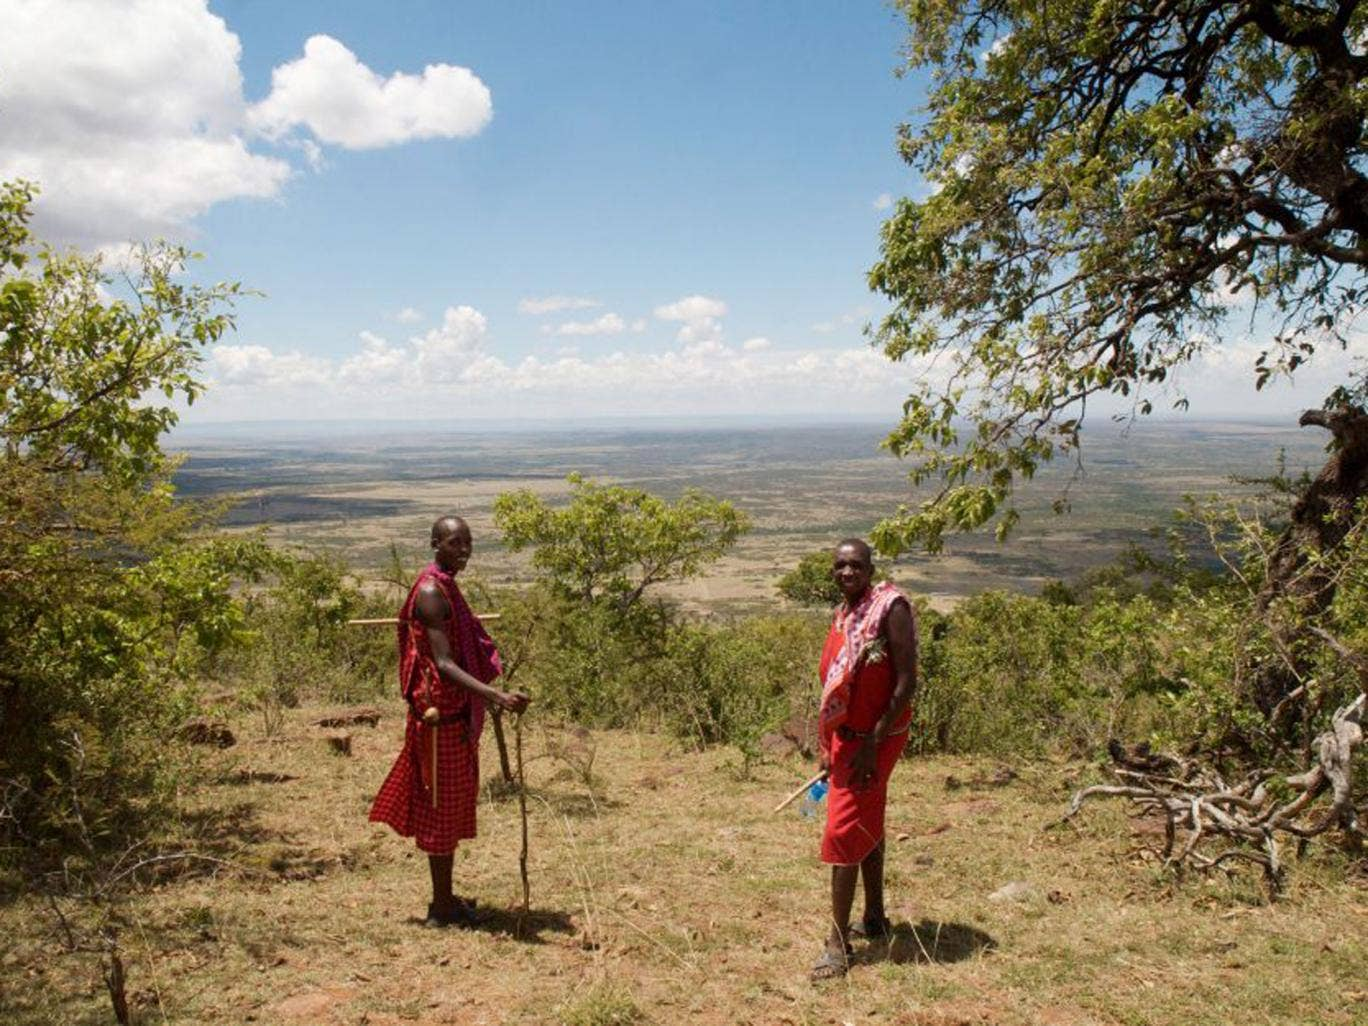 New friends: Maasai villagers Shinka and Taiyio